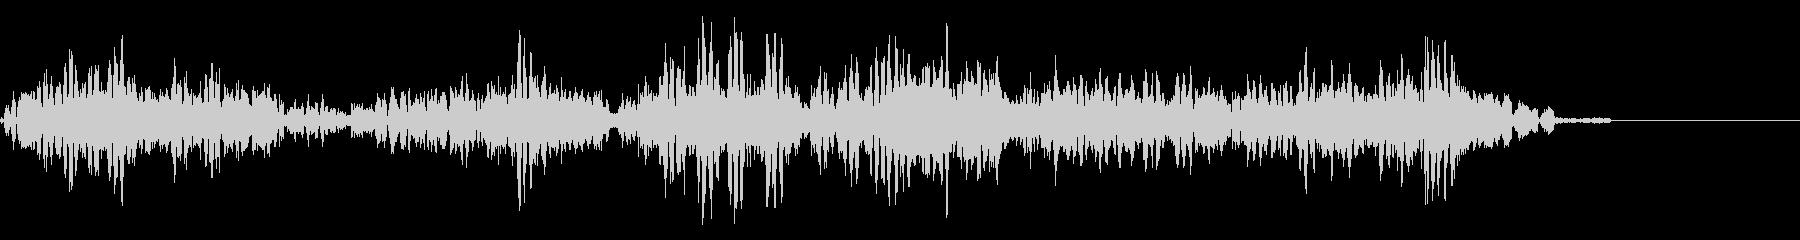 KANT 近未来宇宙人の声効果音1の未再生の波形